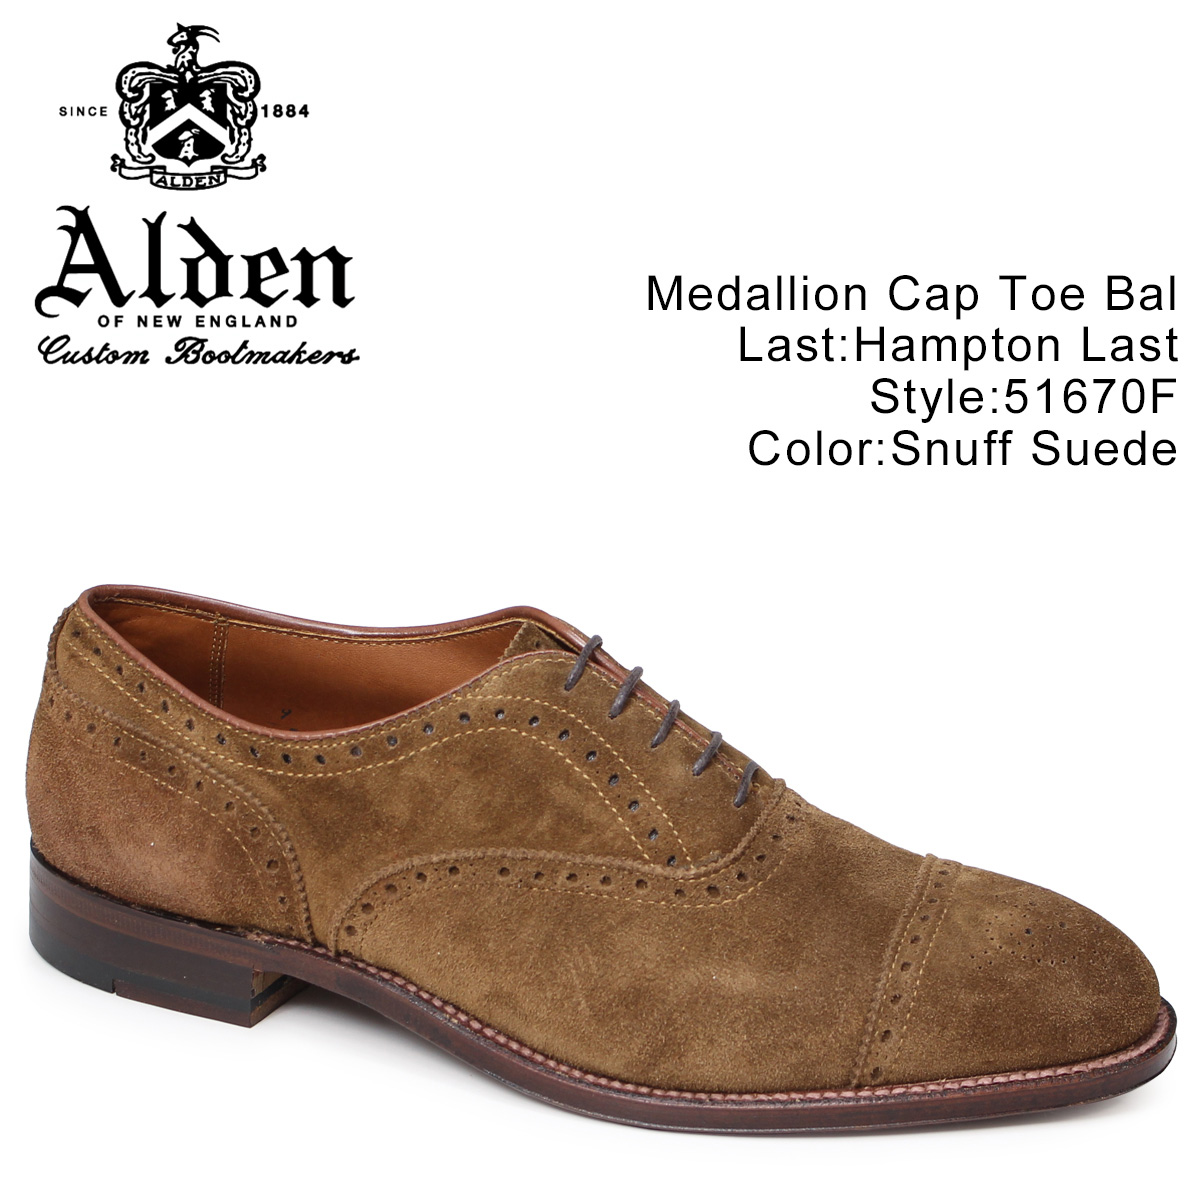 ALDEN オールデン オックスフォード メンズ シューズ MEDALLION CAP TOE Dワイズ 51670F